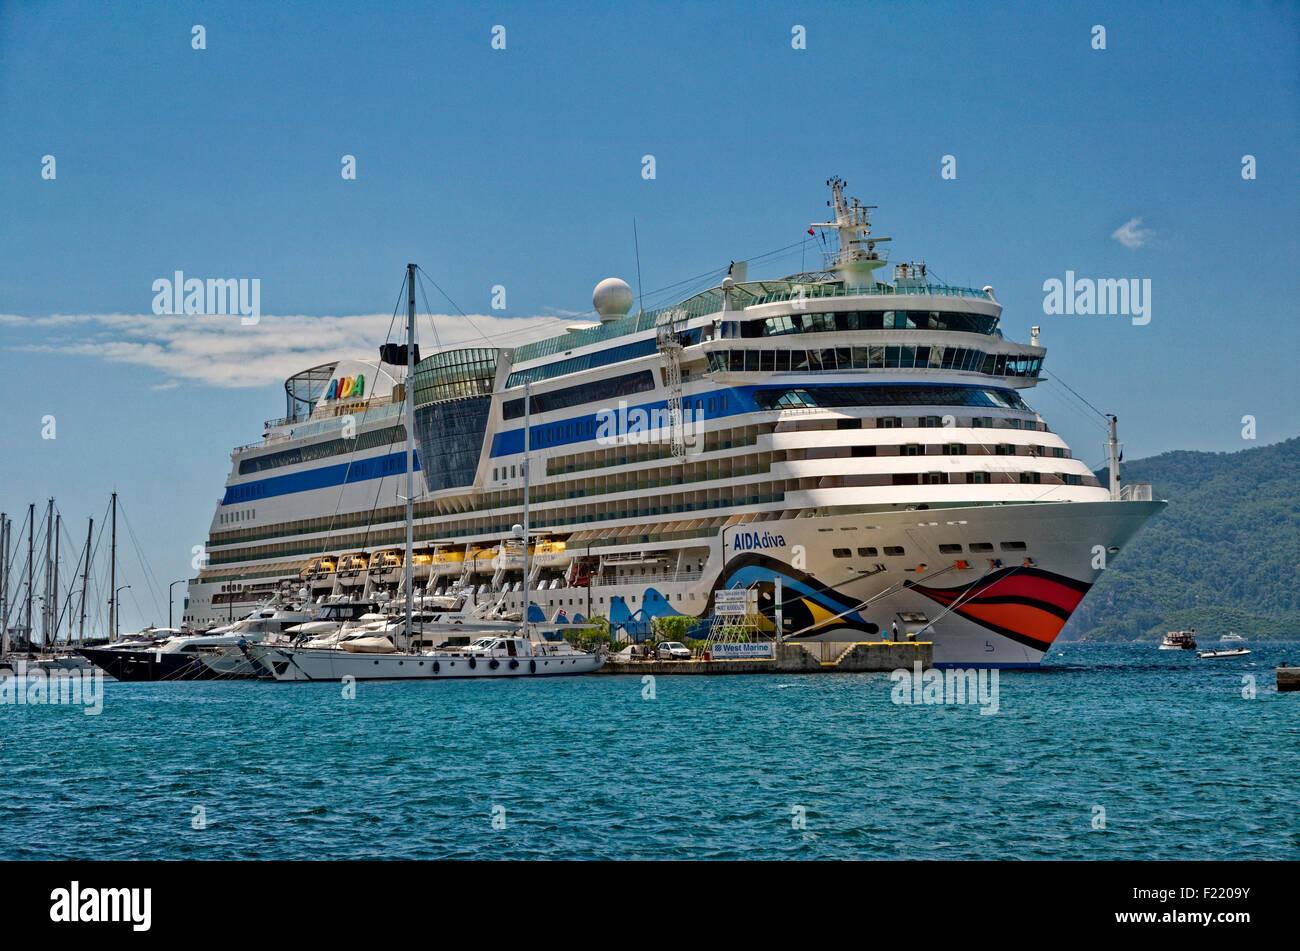 Cruise ship AIDA Diva on quay at the Cruise port of Marmaris, Turkey. Stock Photo